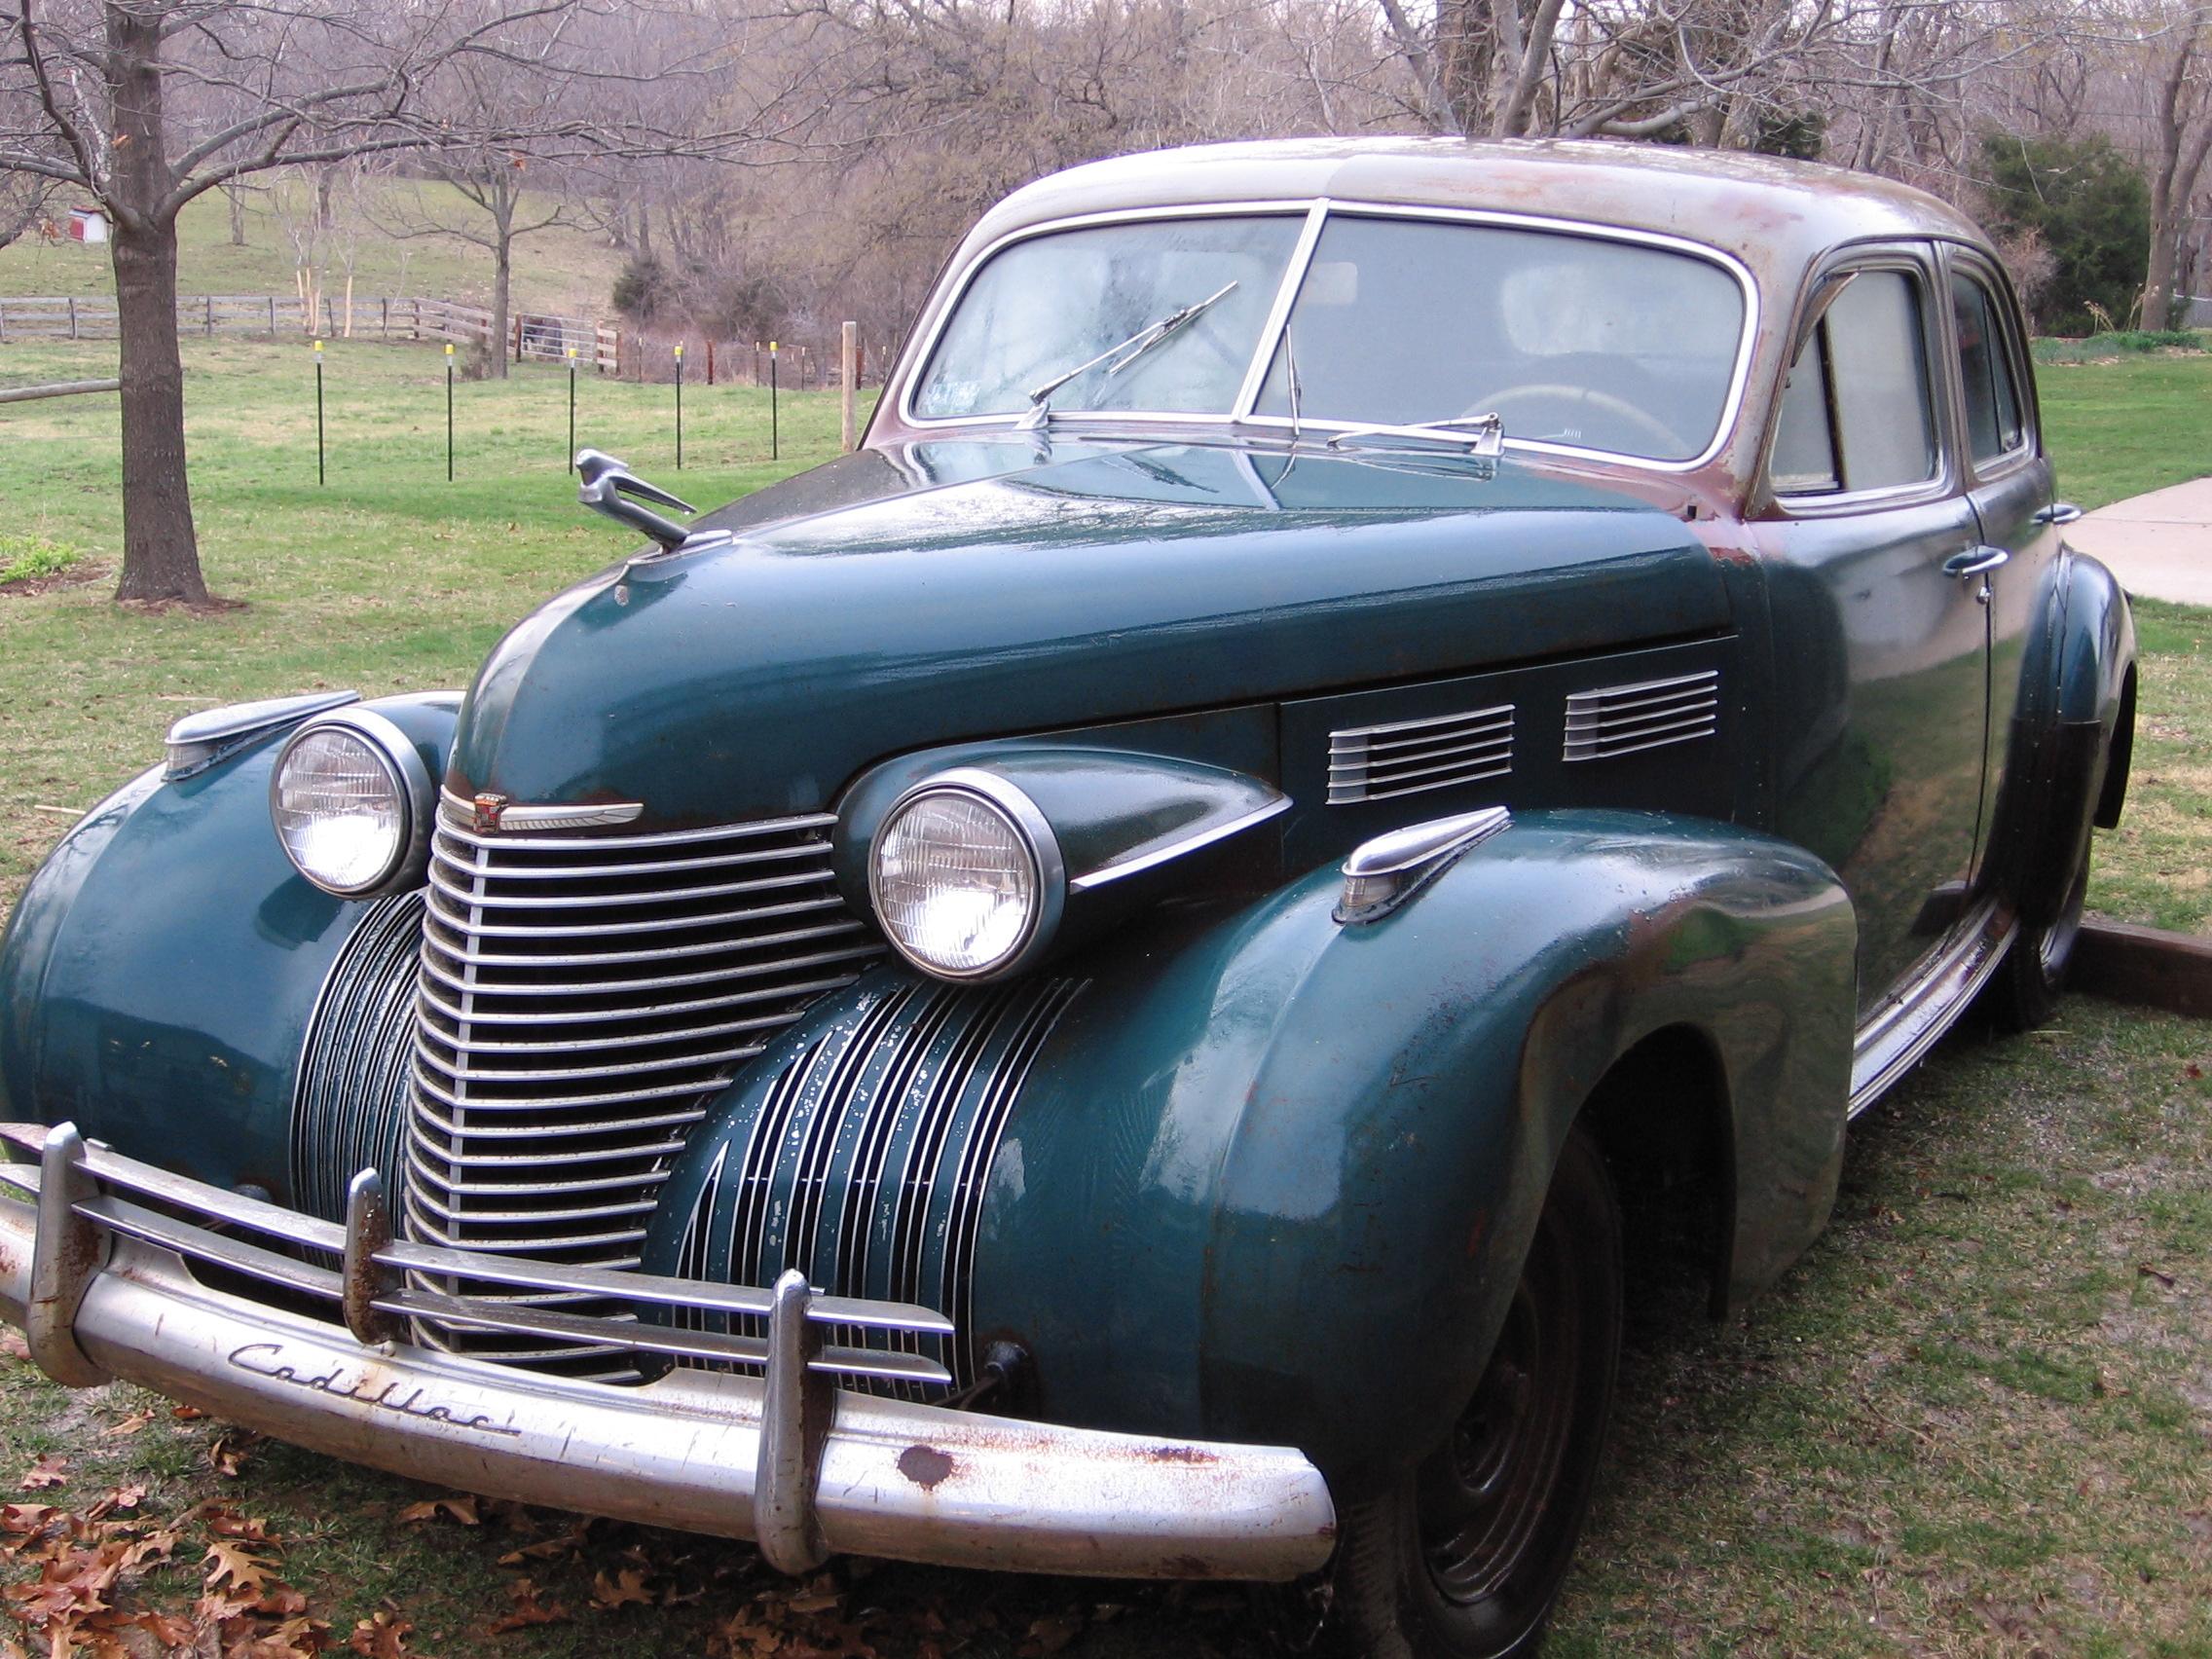 1940 Cadillac 4-Door Sedan.